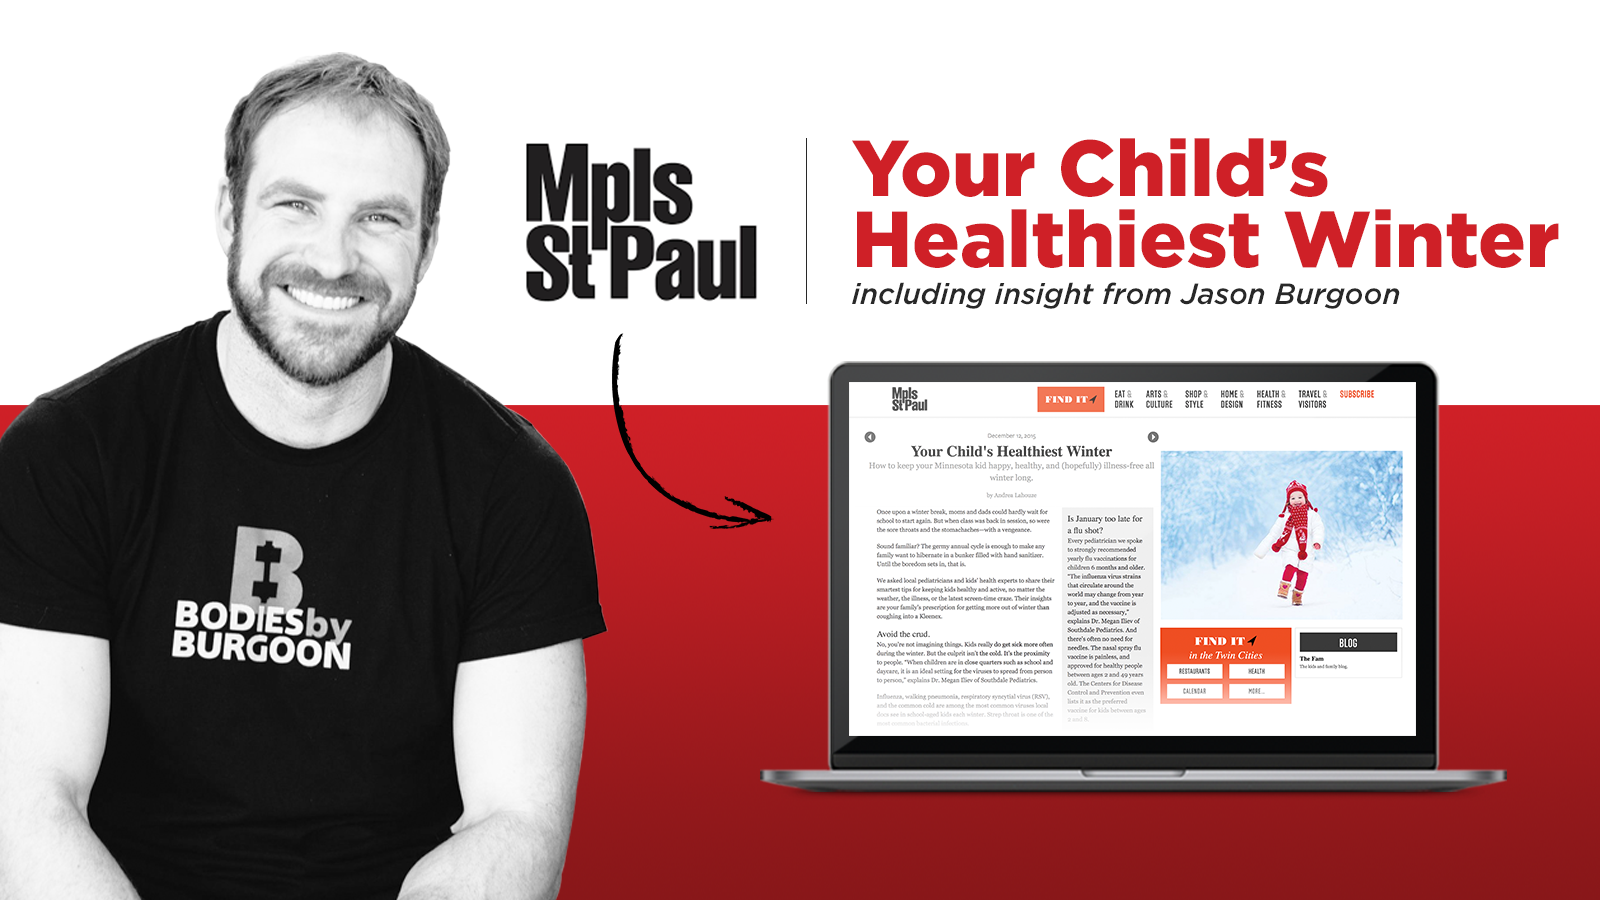 2015-12-15: MplsStPaul Magazine